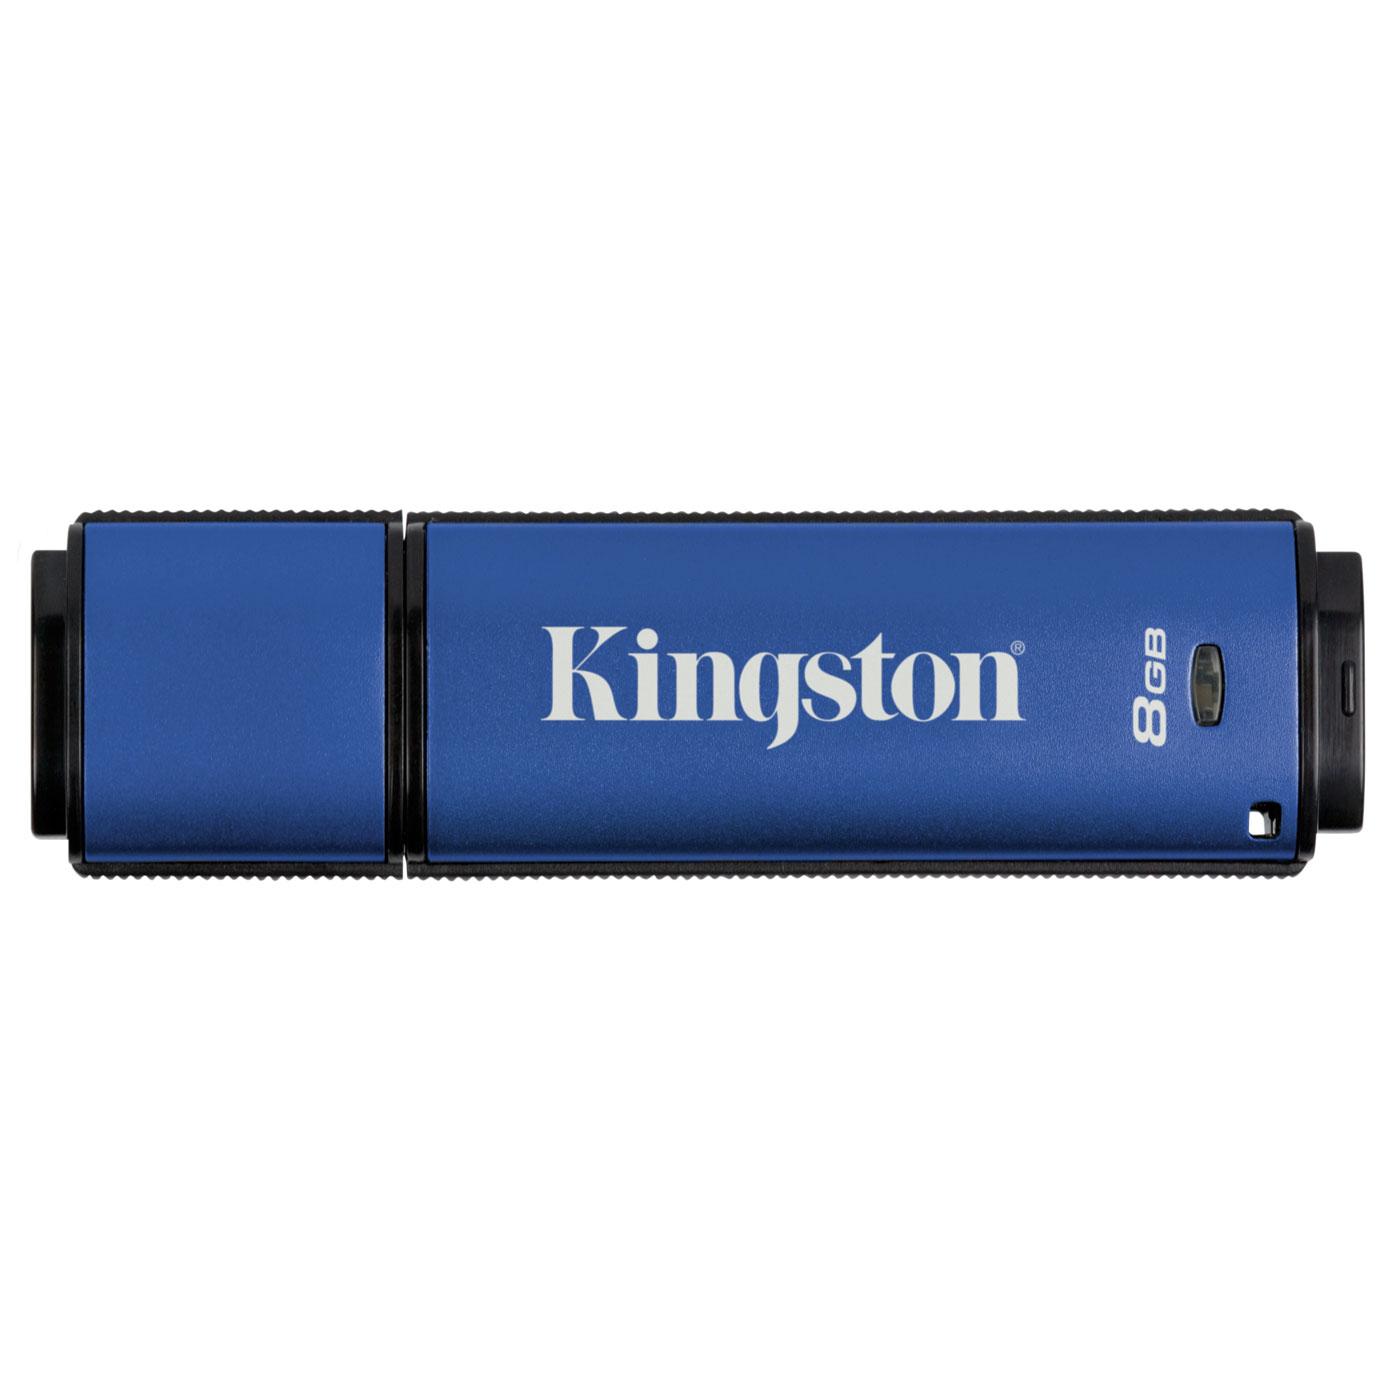 Clé USB Kingston DataTraveler Vault Privacy Managed 8 Go Kingston DataTraveler Vault Privacy Managed 8 Go - USB 2.0 (garantie constructeur 5 ans)